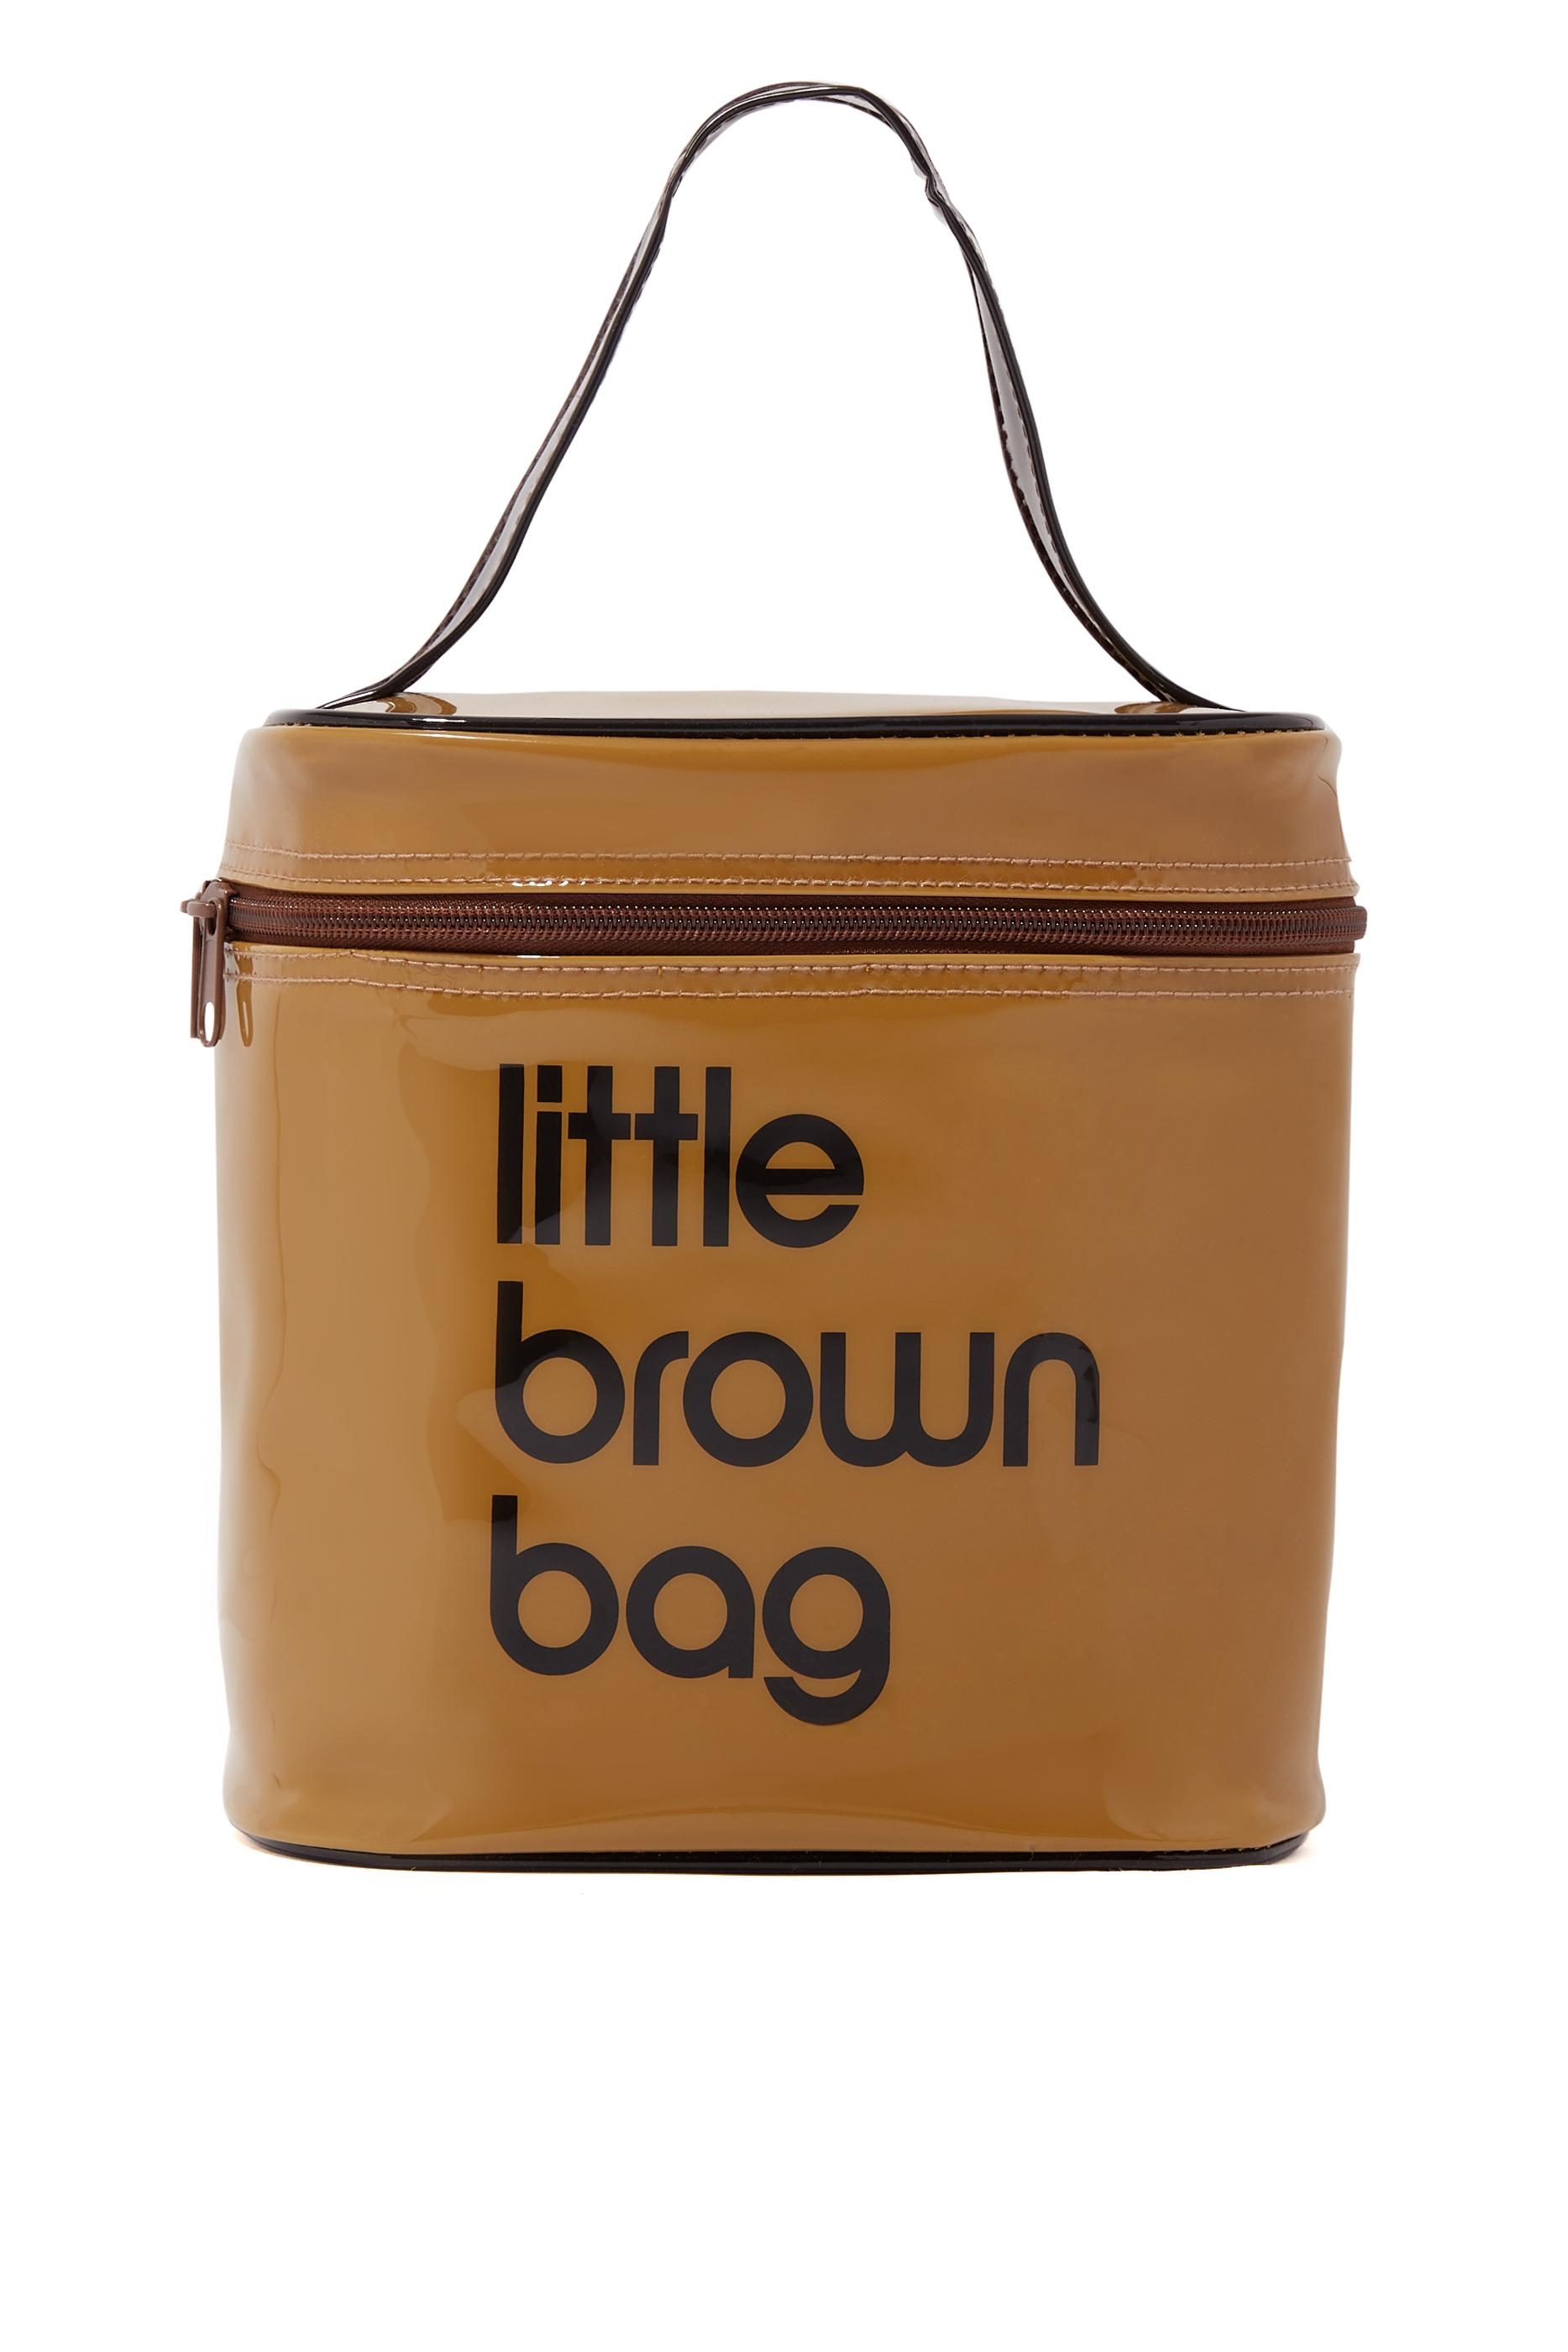 Work Bag Women, Work Tote, Coral Bag, Laptop Bag, Cork Bag